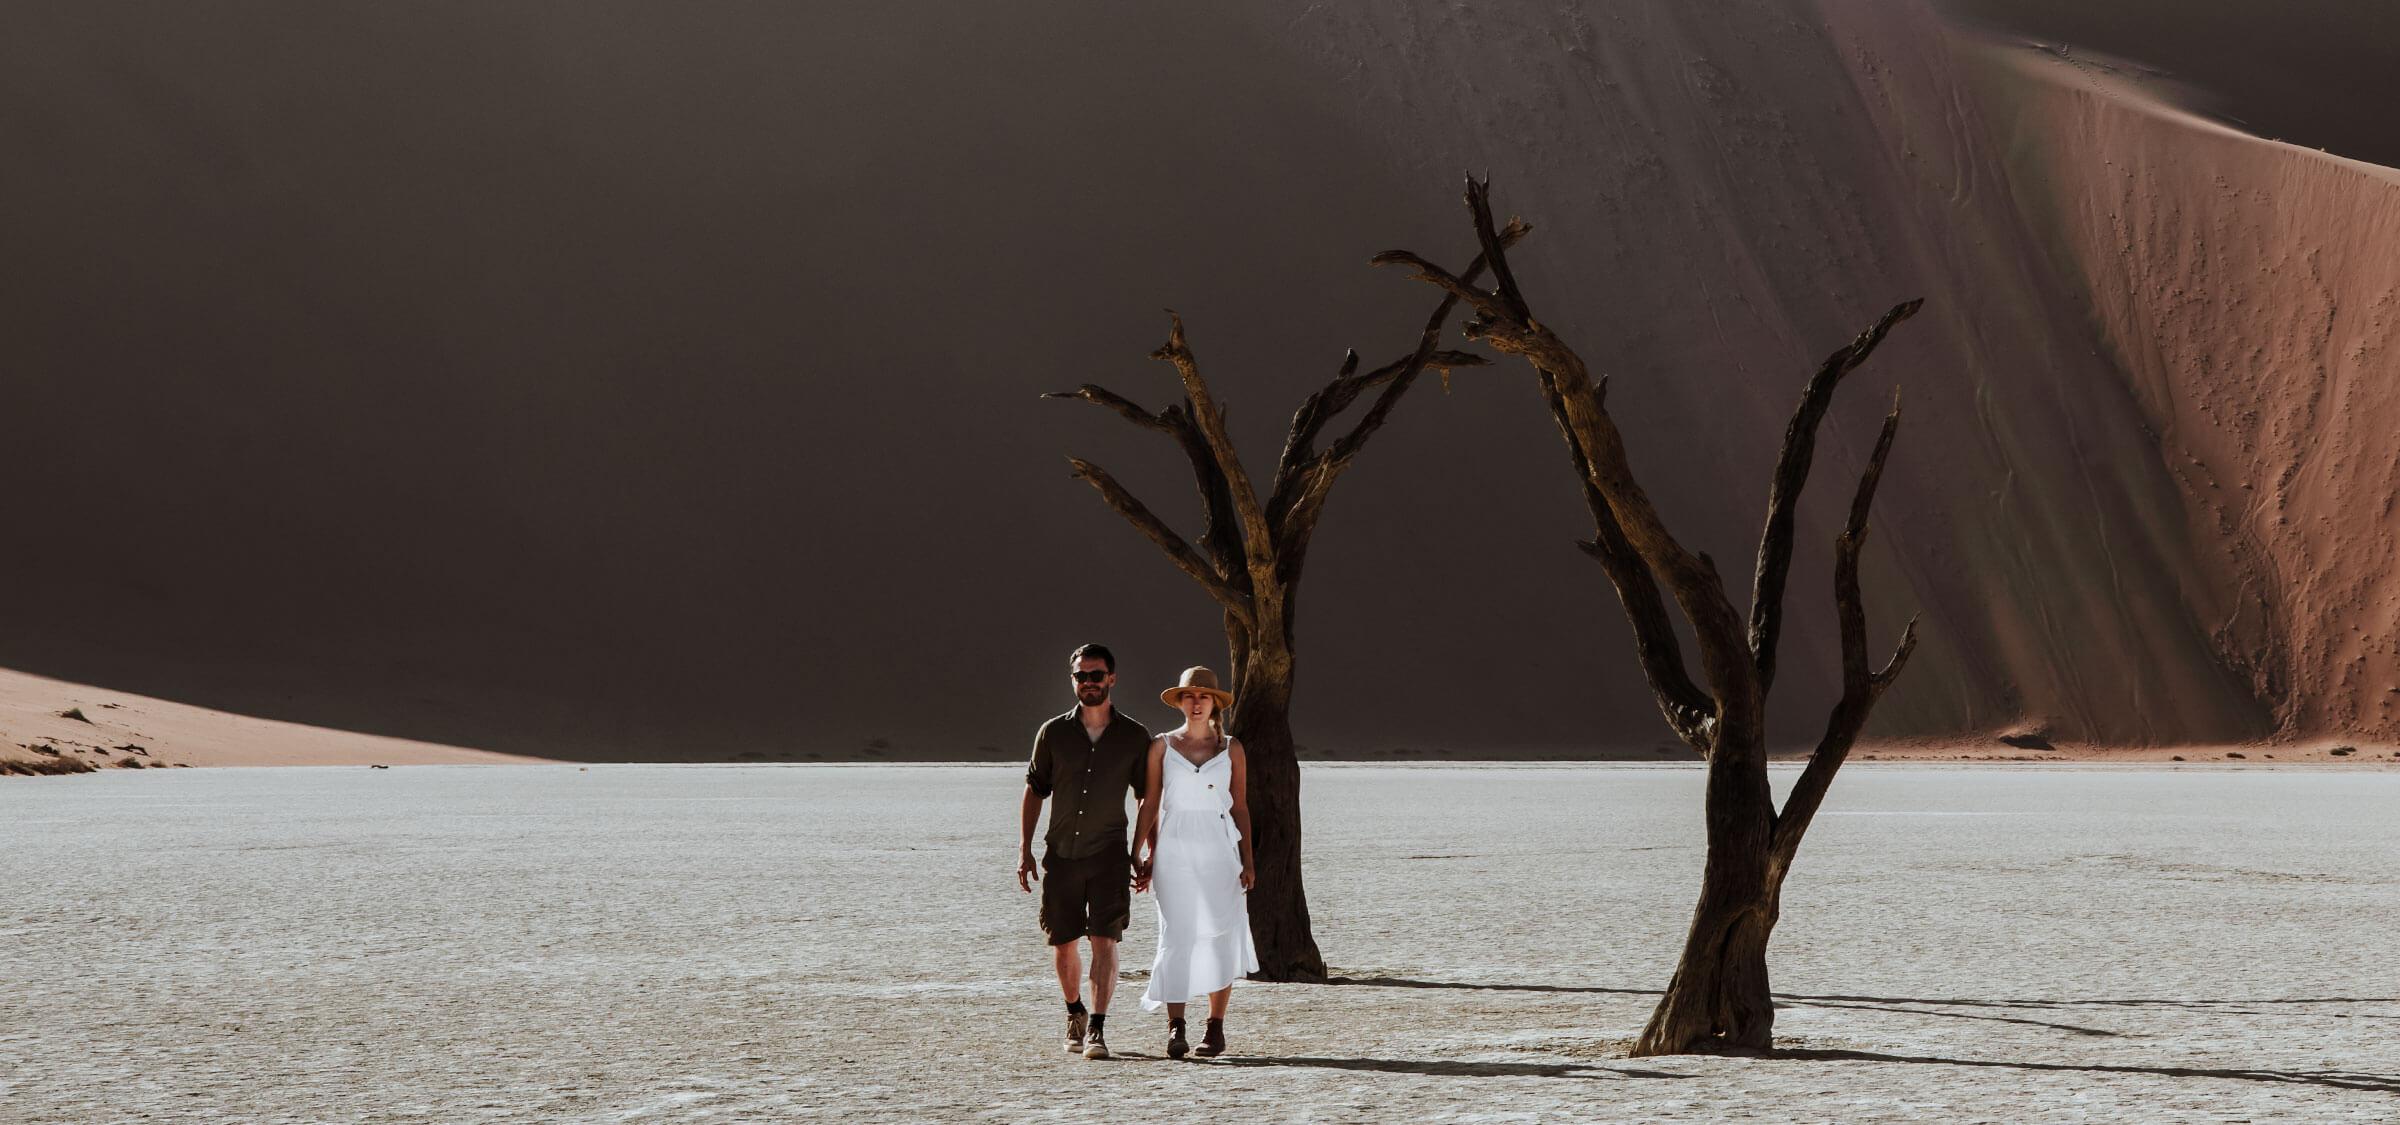 Seeking adventure in Namibia